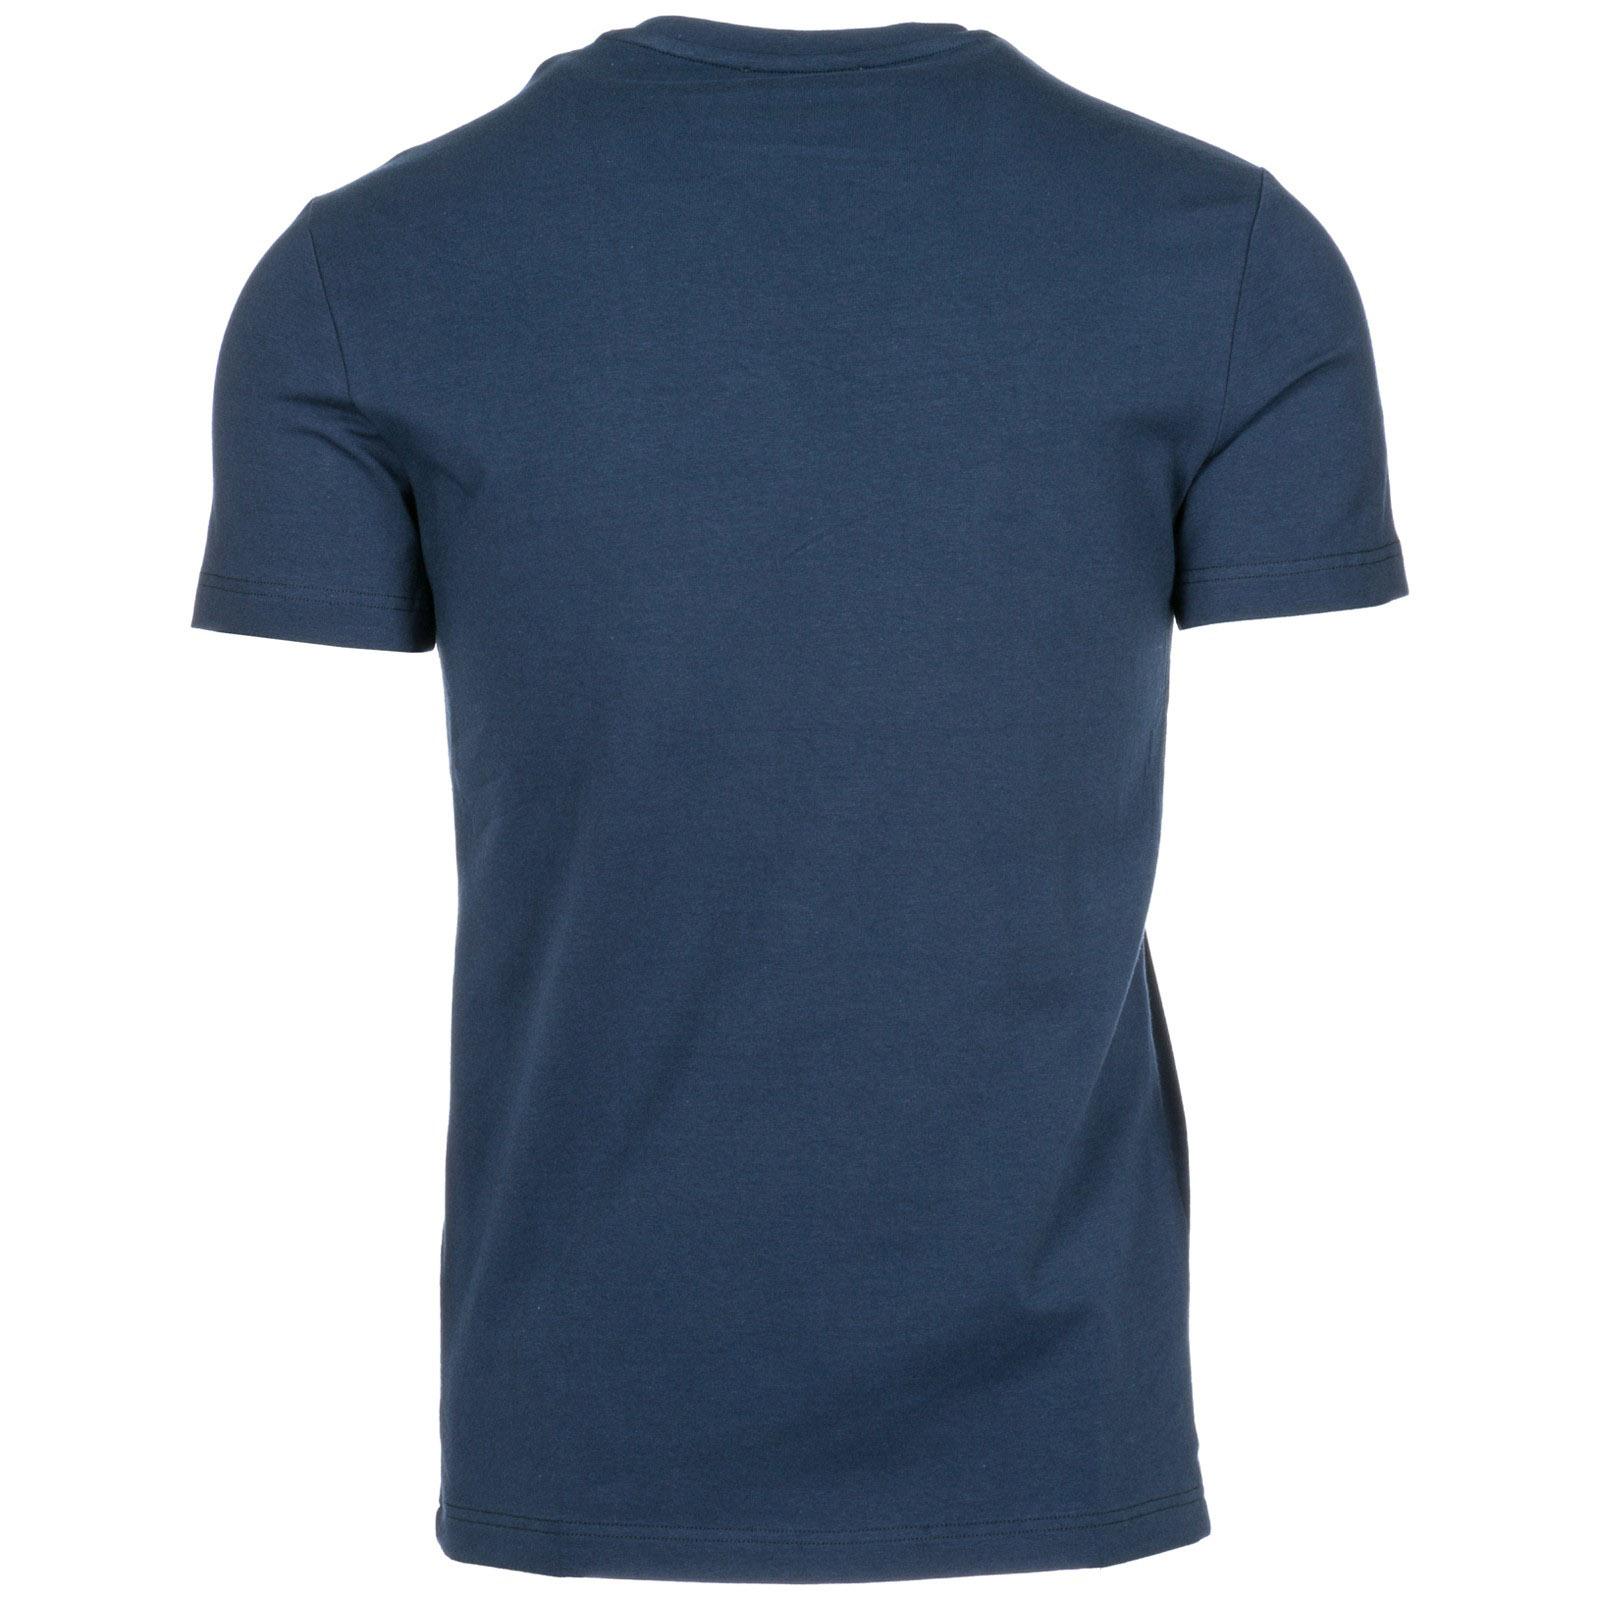 T-shirt Versace Jeans B3GSB74J blu   FRMODA.com 28070d1cd858